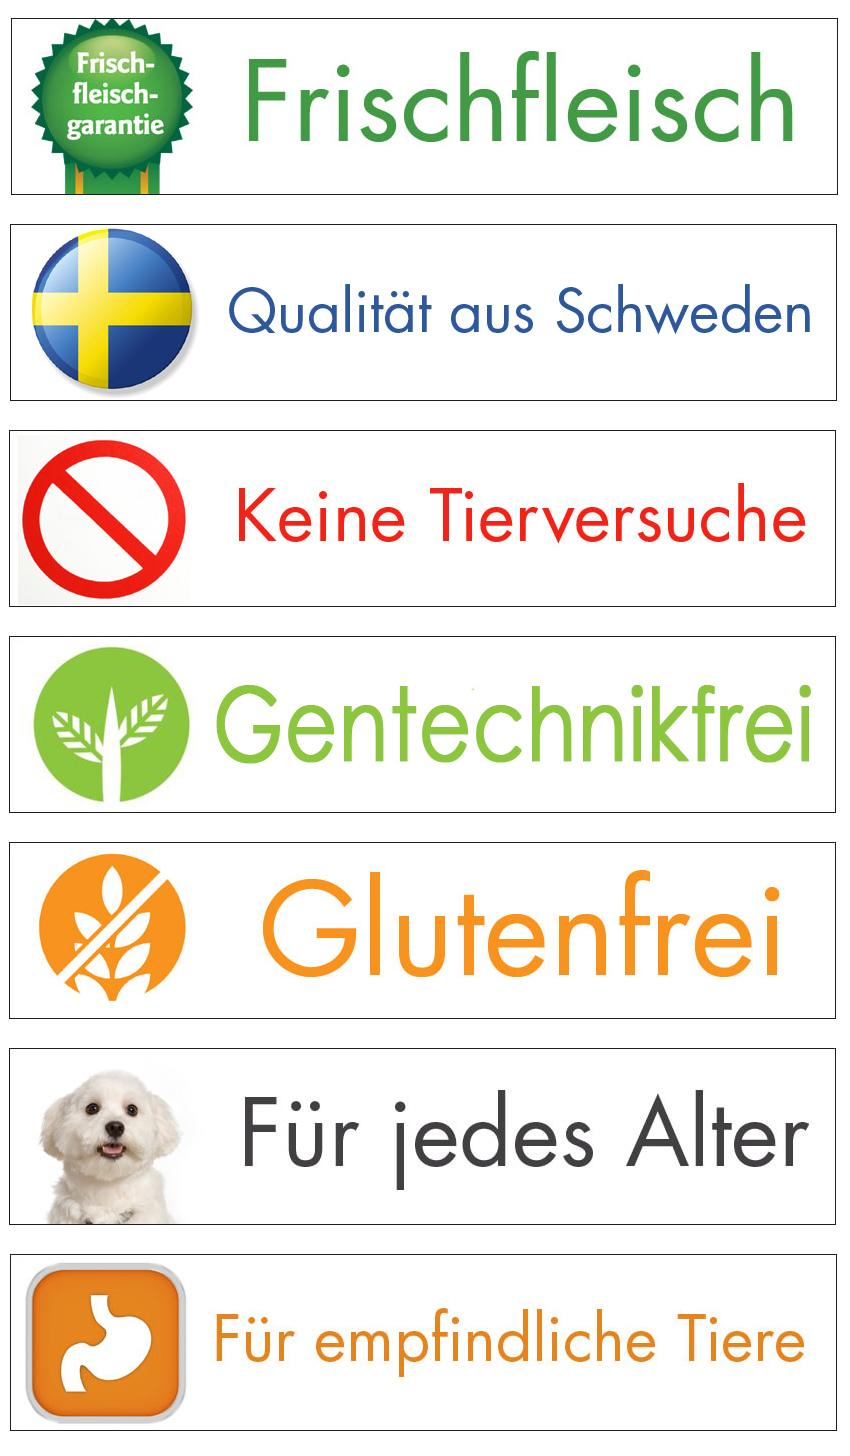 C:\fakepath\Anifit Hundefutter katzenfutter Besonderheiten